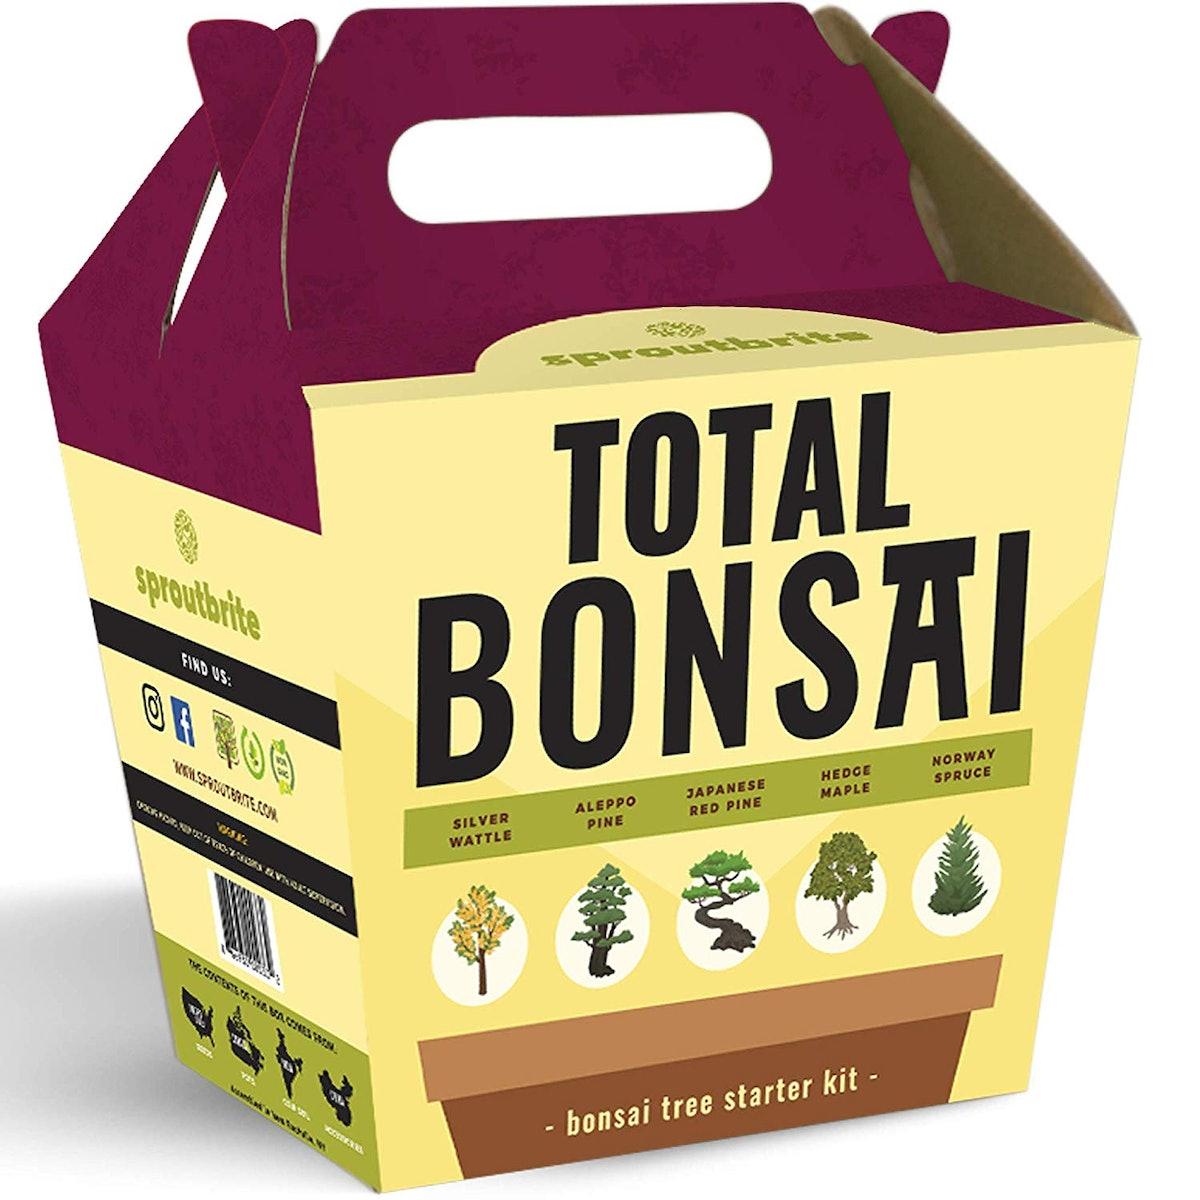 Sproutbrite Bonsai Tree Starter Kit